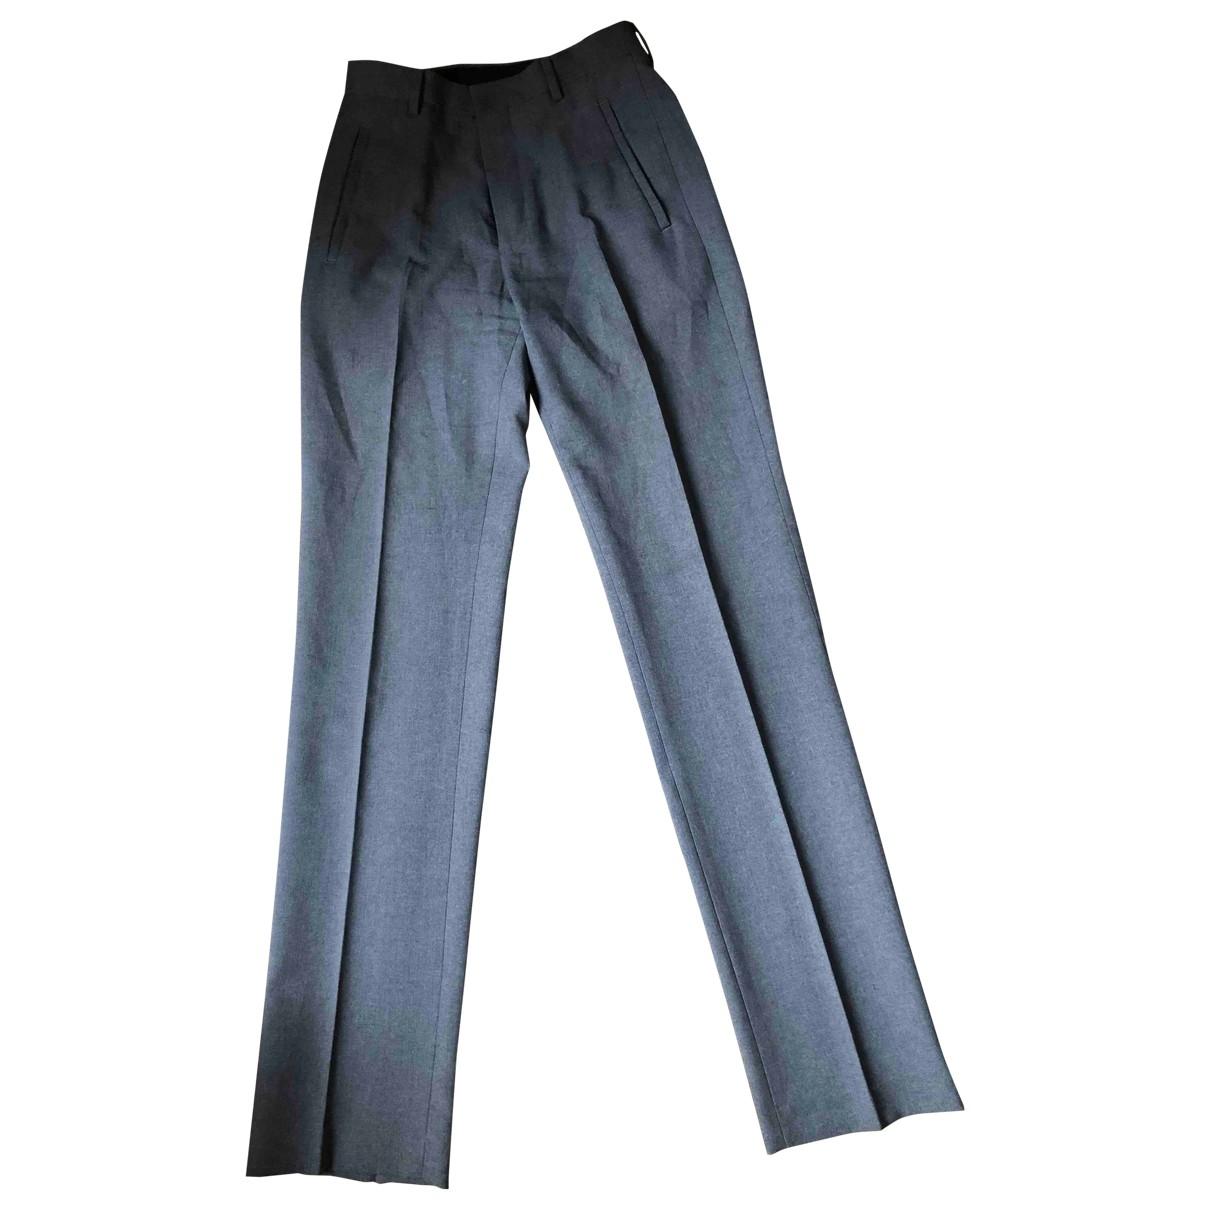 Dkny \N Grey Trousers for Women 38 FR